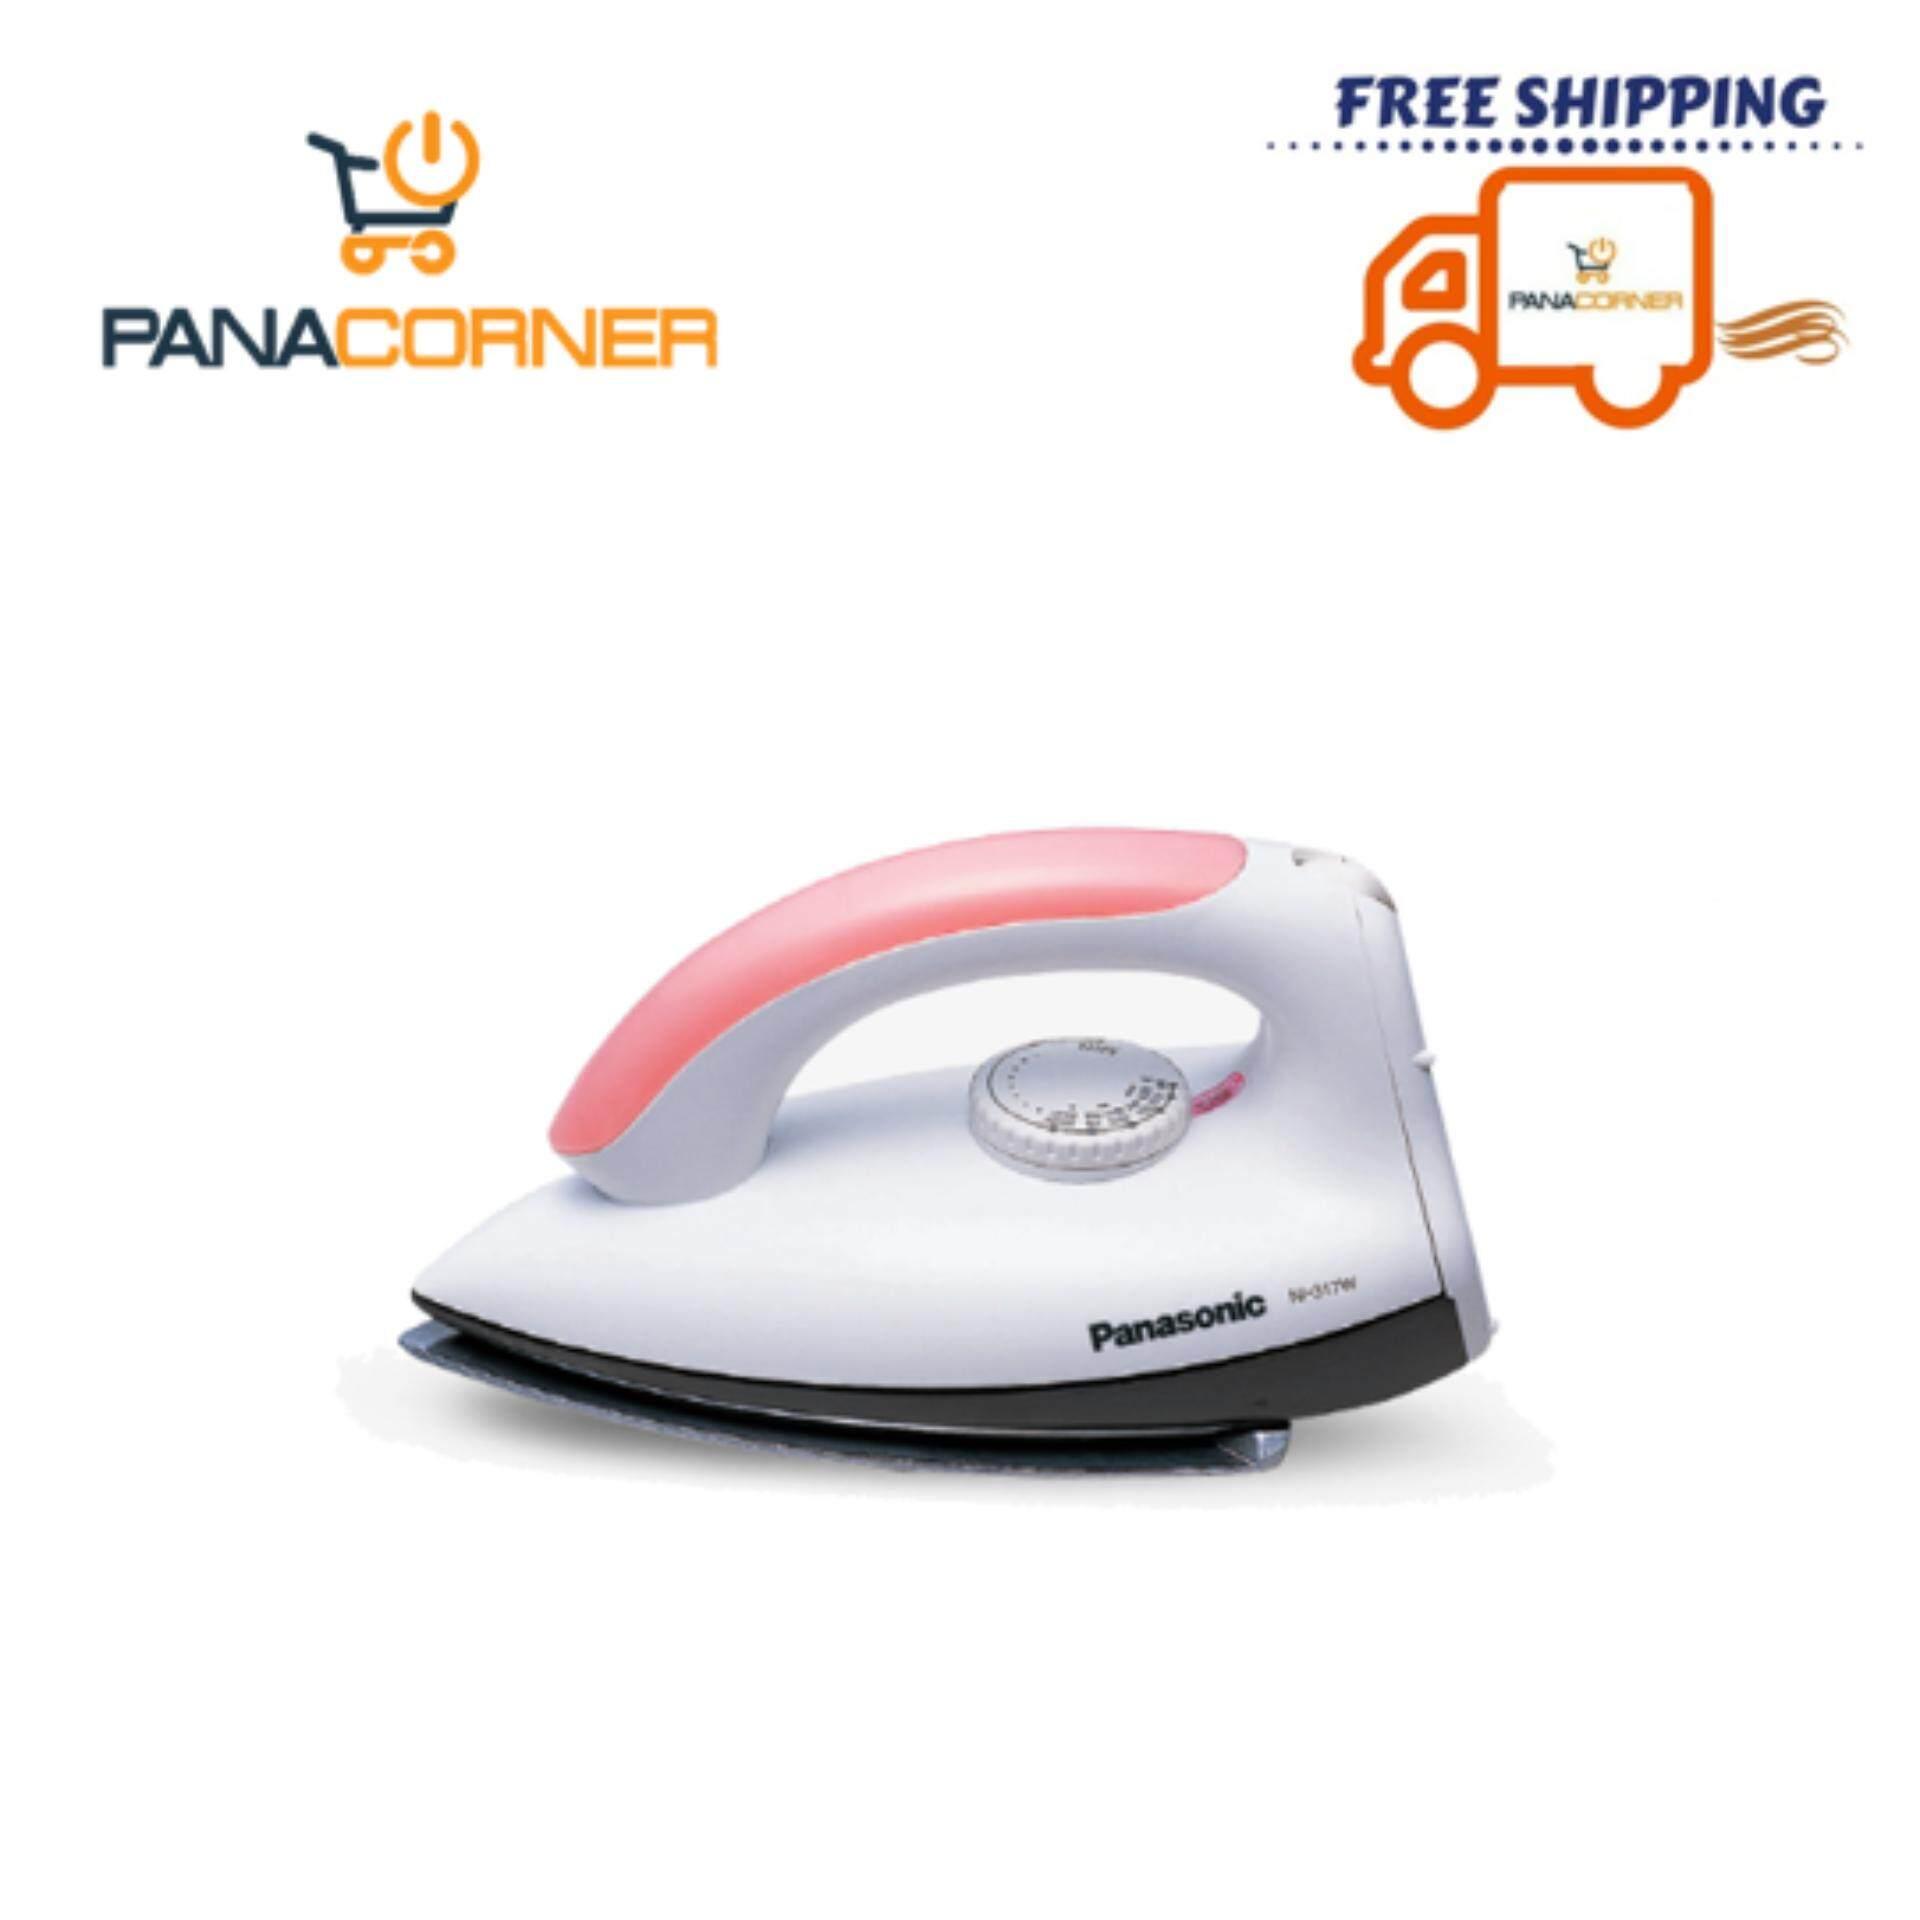 Panasonic POLISHED DRY IRON NI 317W Light Pink